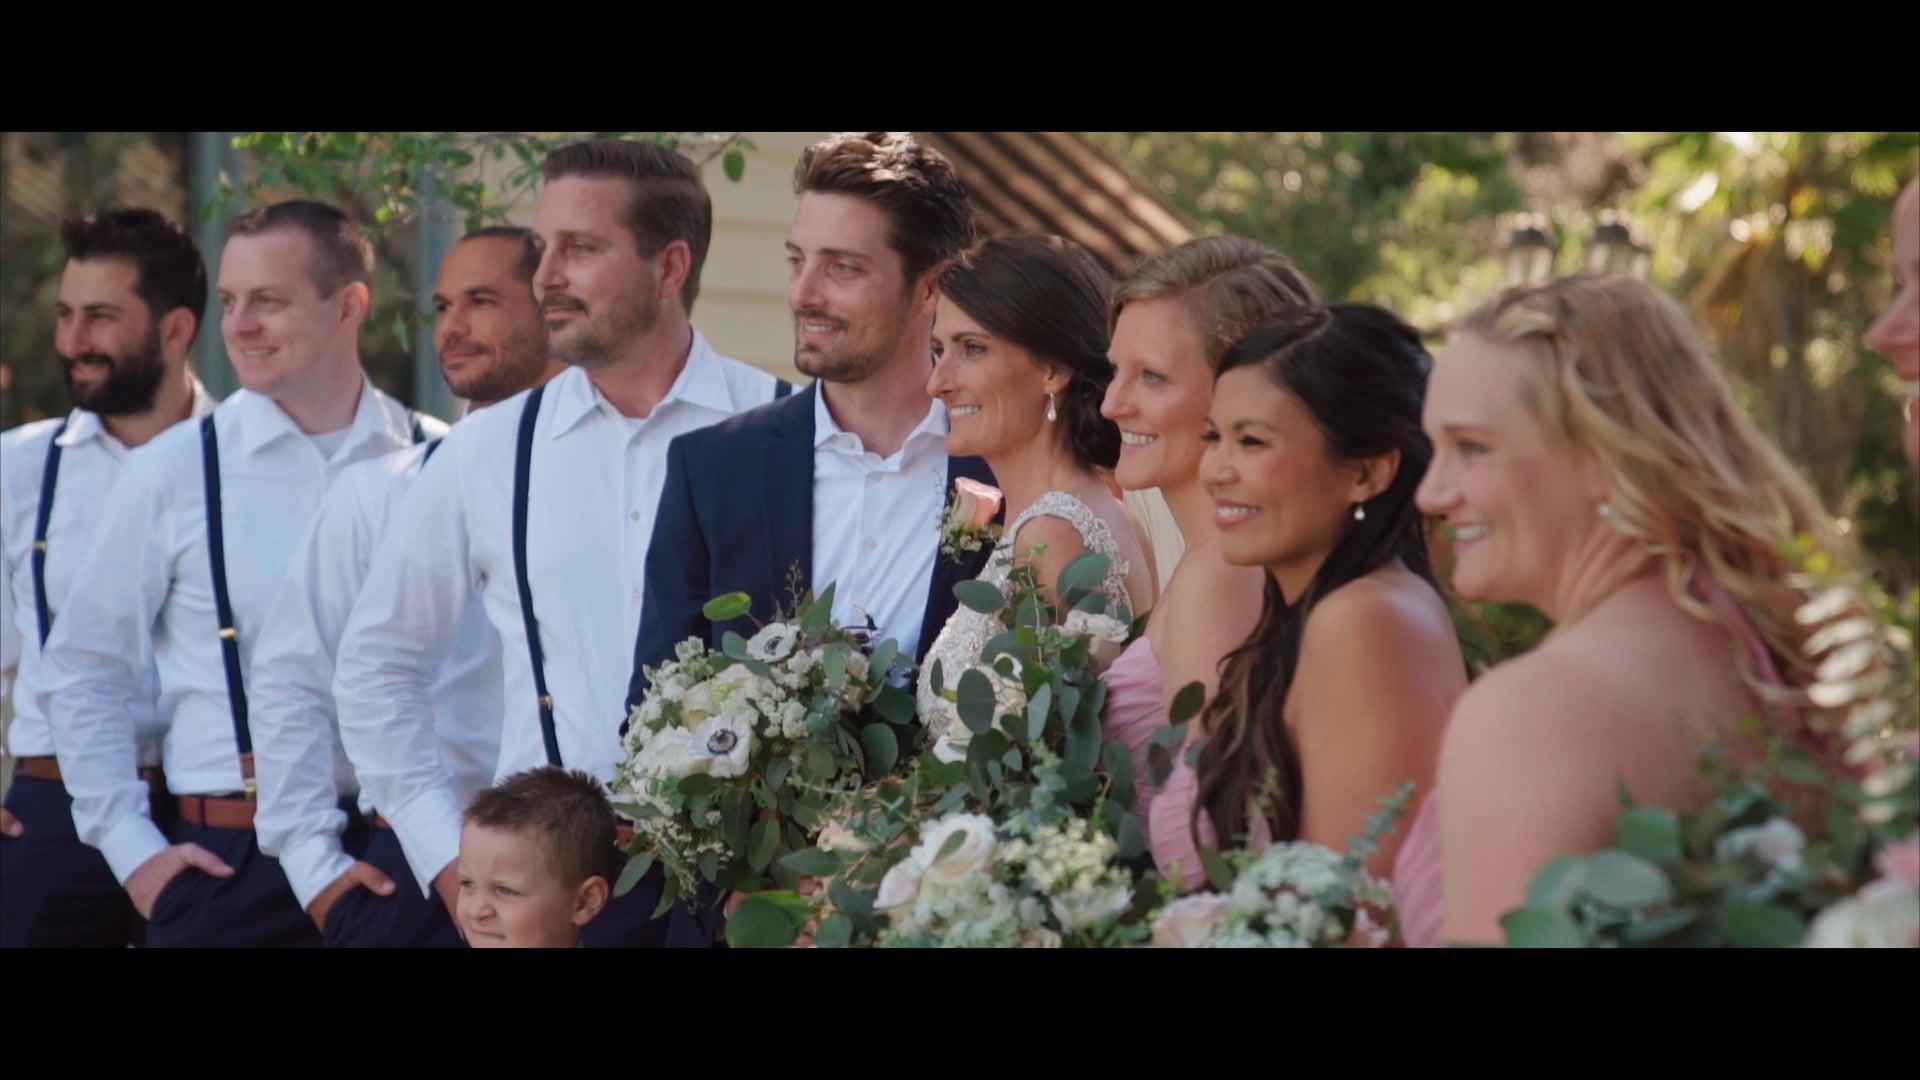 Micah and Mandy wedding video